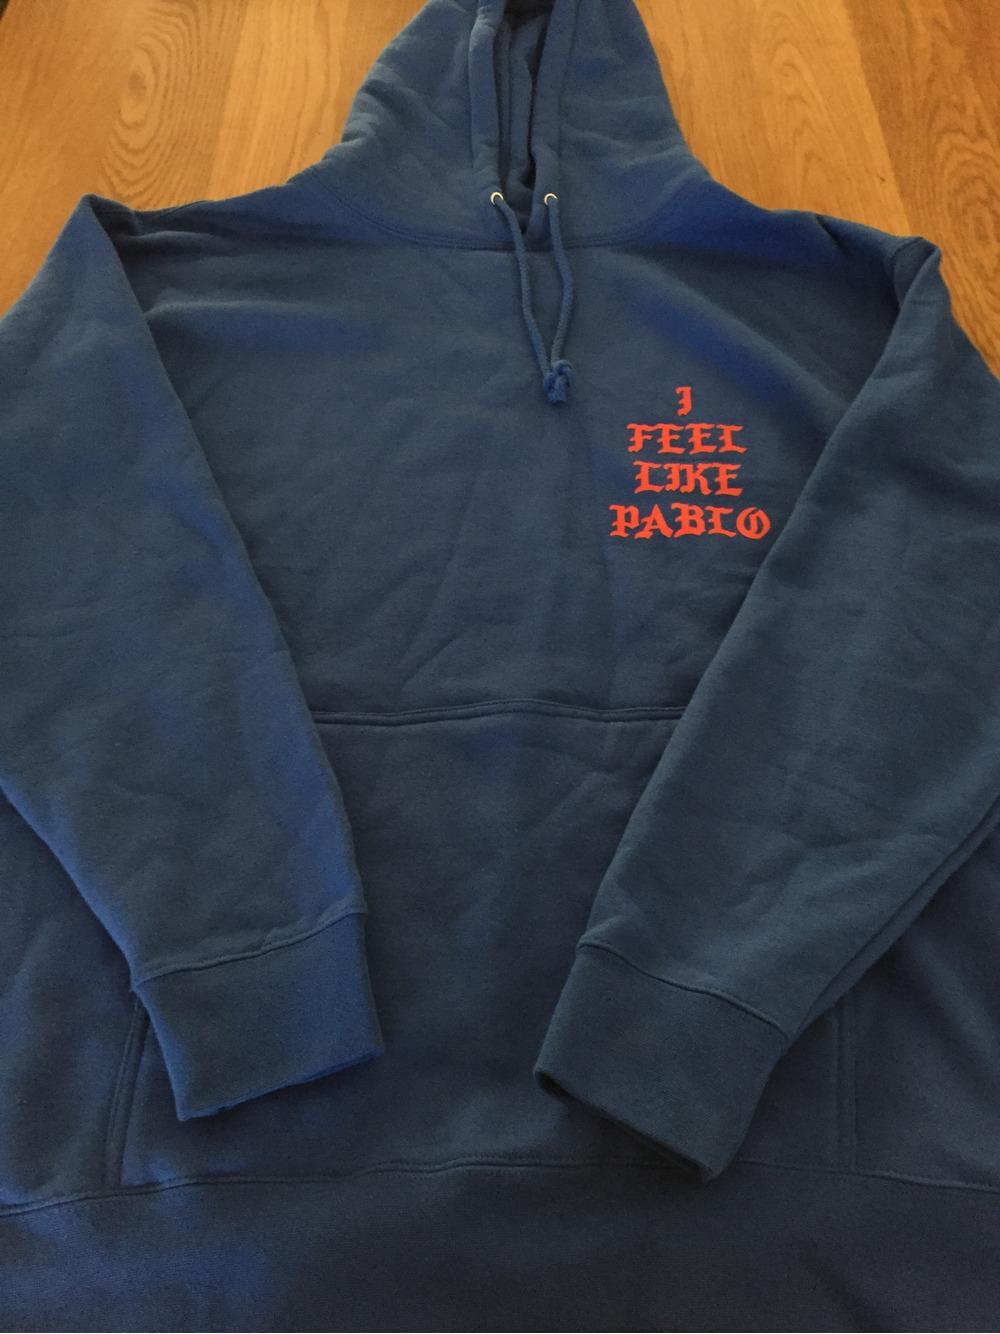 kanye west the life of pablo merchandise hoodie supreme. Black Bedroom Furniture Sets. Home Design Ideas